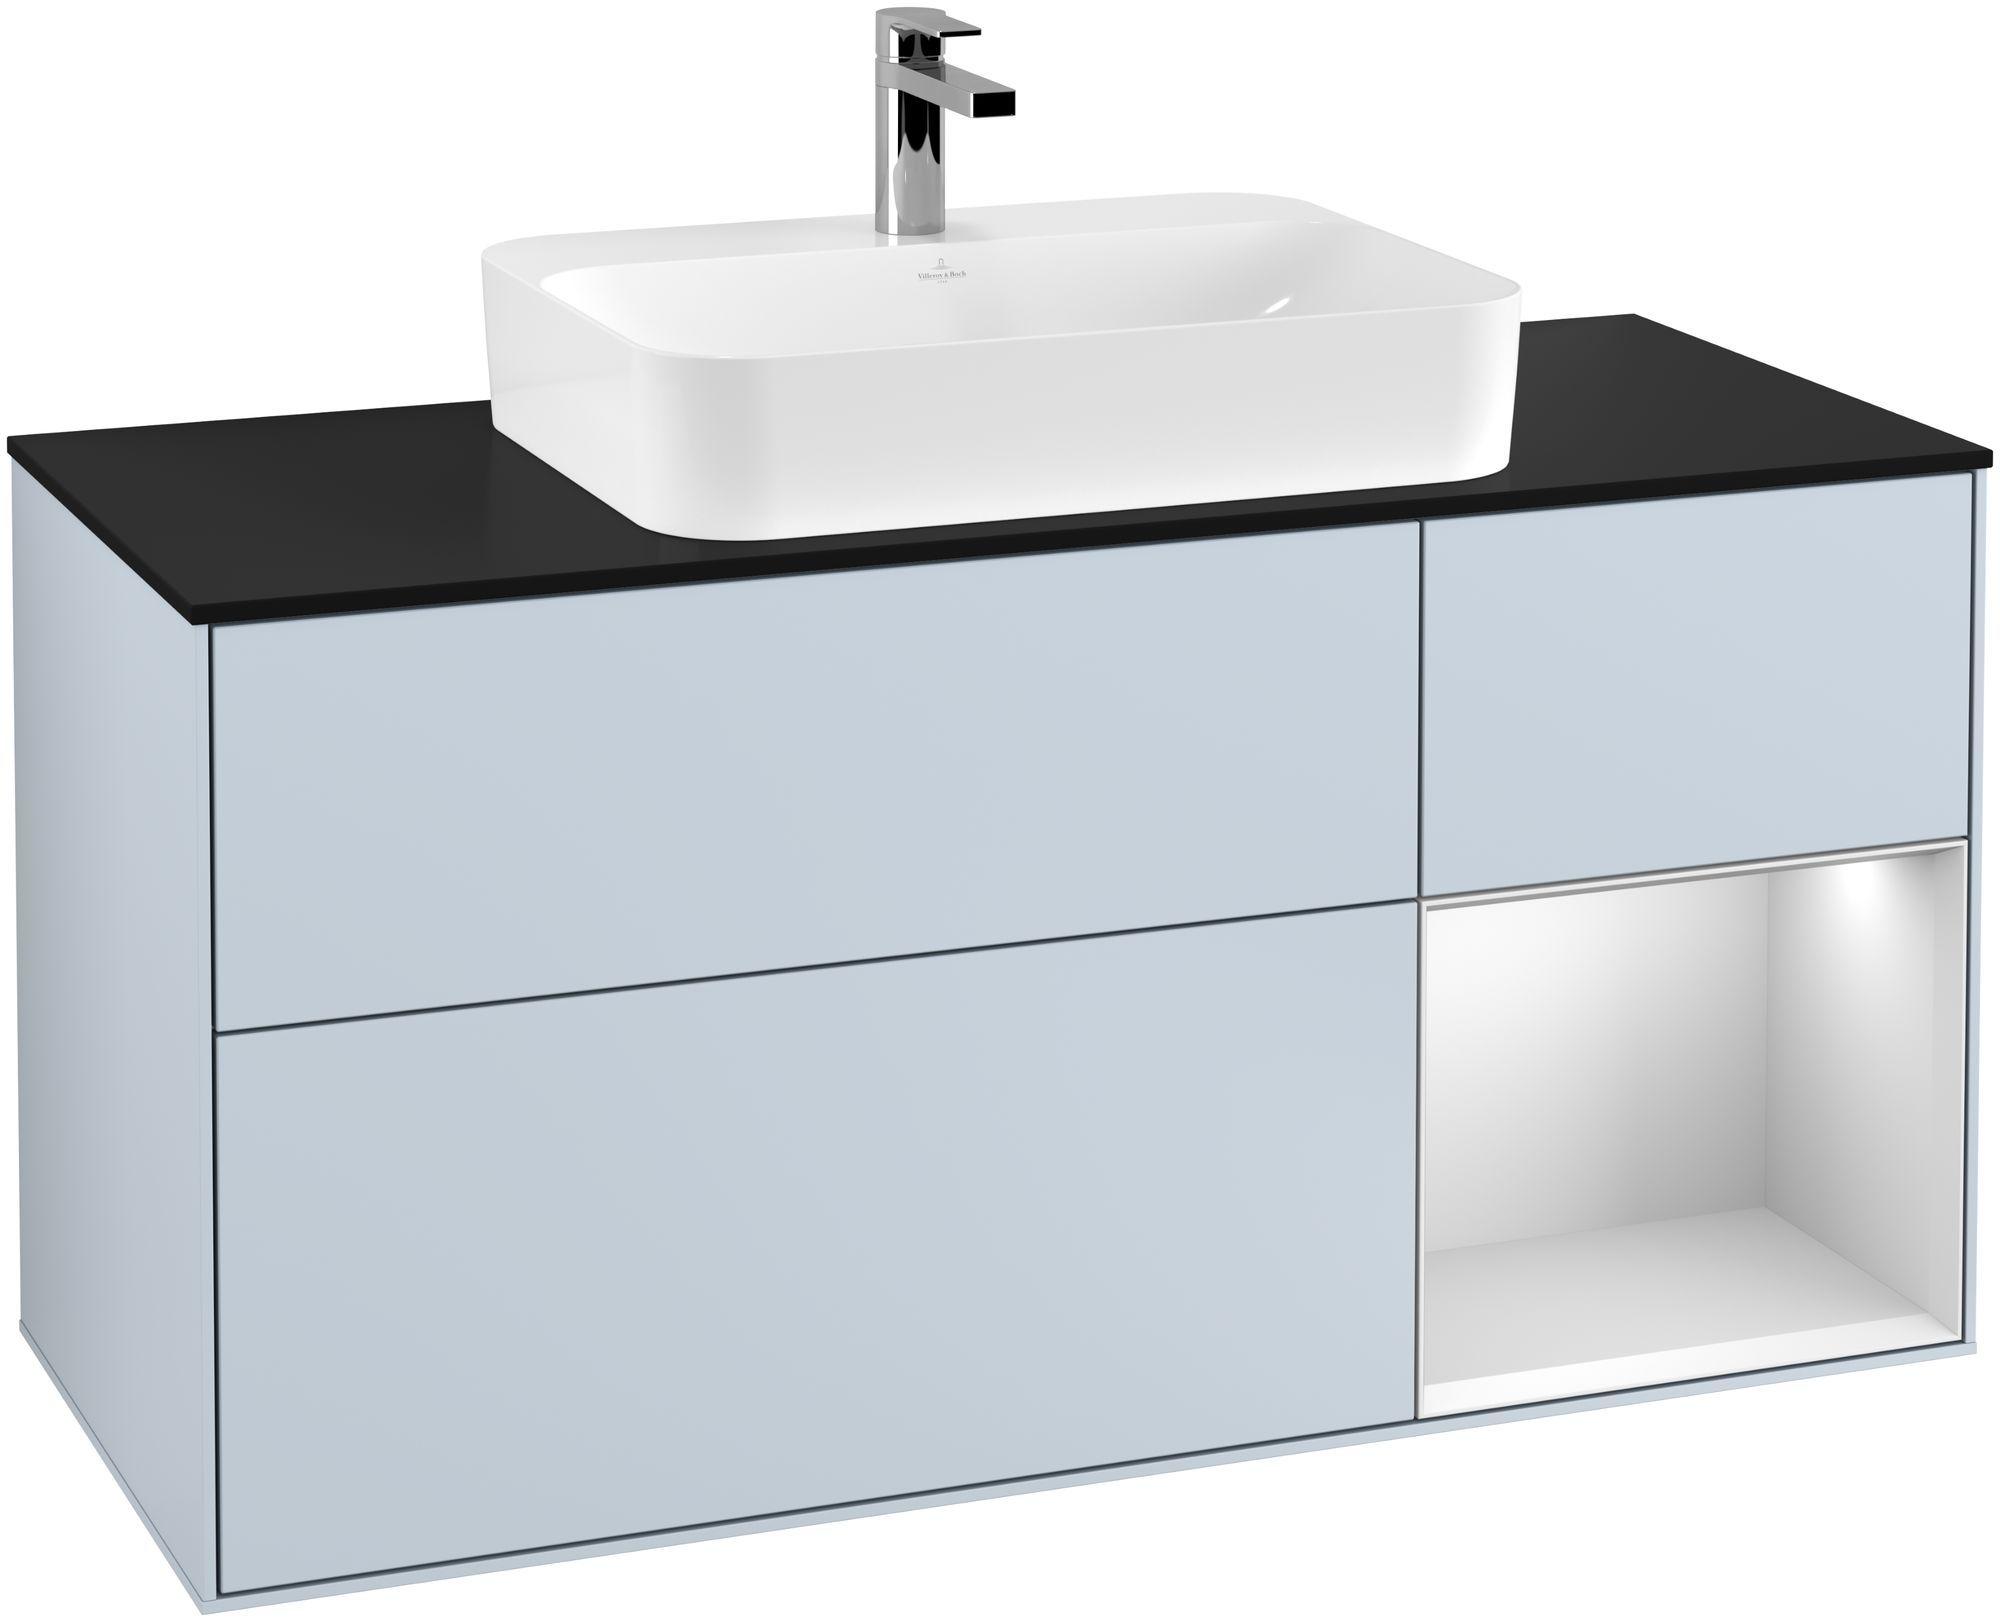 Villeroy & Boch Finion F42 Waschtischunterschrank mit Regalelement 3 Auszüge Waschtisch mittig LED-Beleuchtung B:120xH:60,3xT:50,1cm Front, Korpus: Cloud, Regal: Weiß Matt Soft Grey, Glasplatte: Black Matt F422MTHA